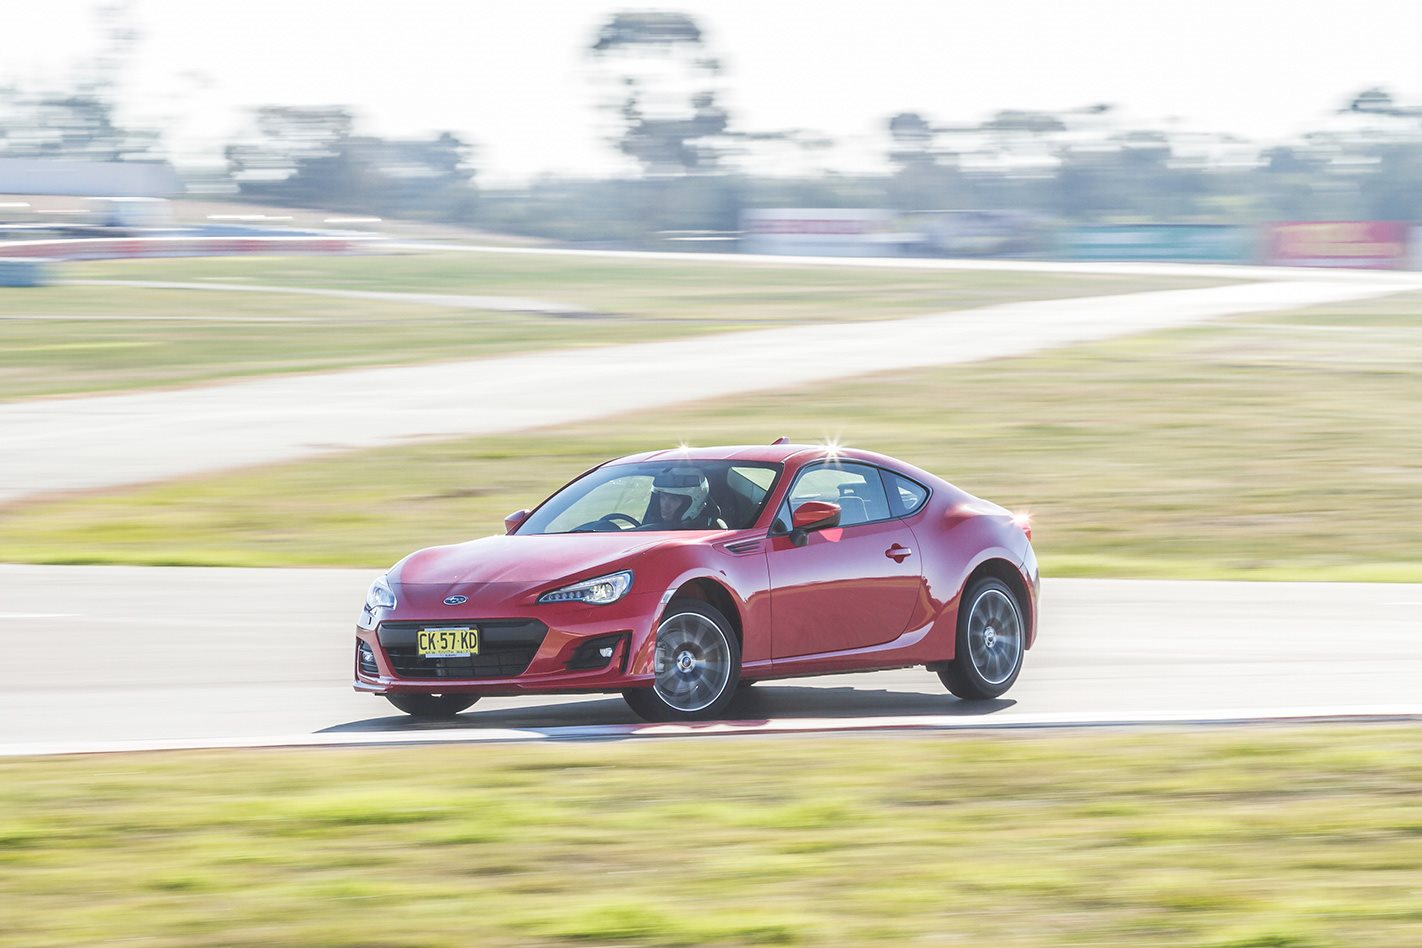 2017 Subaru BRZ BFYB test lap